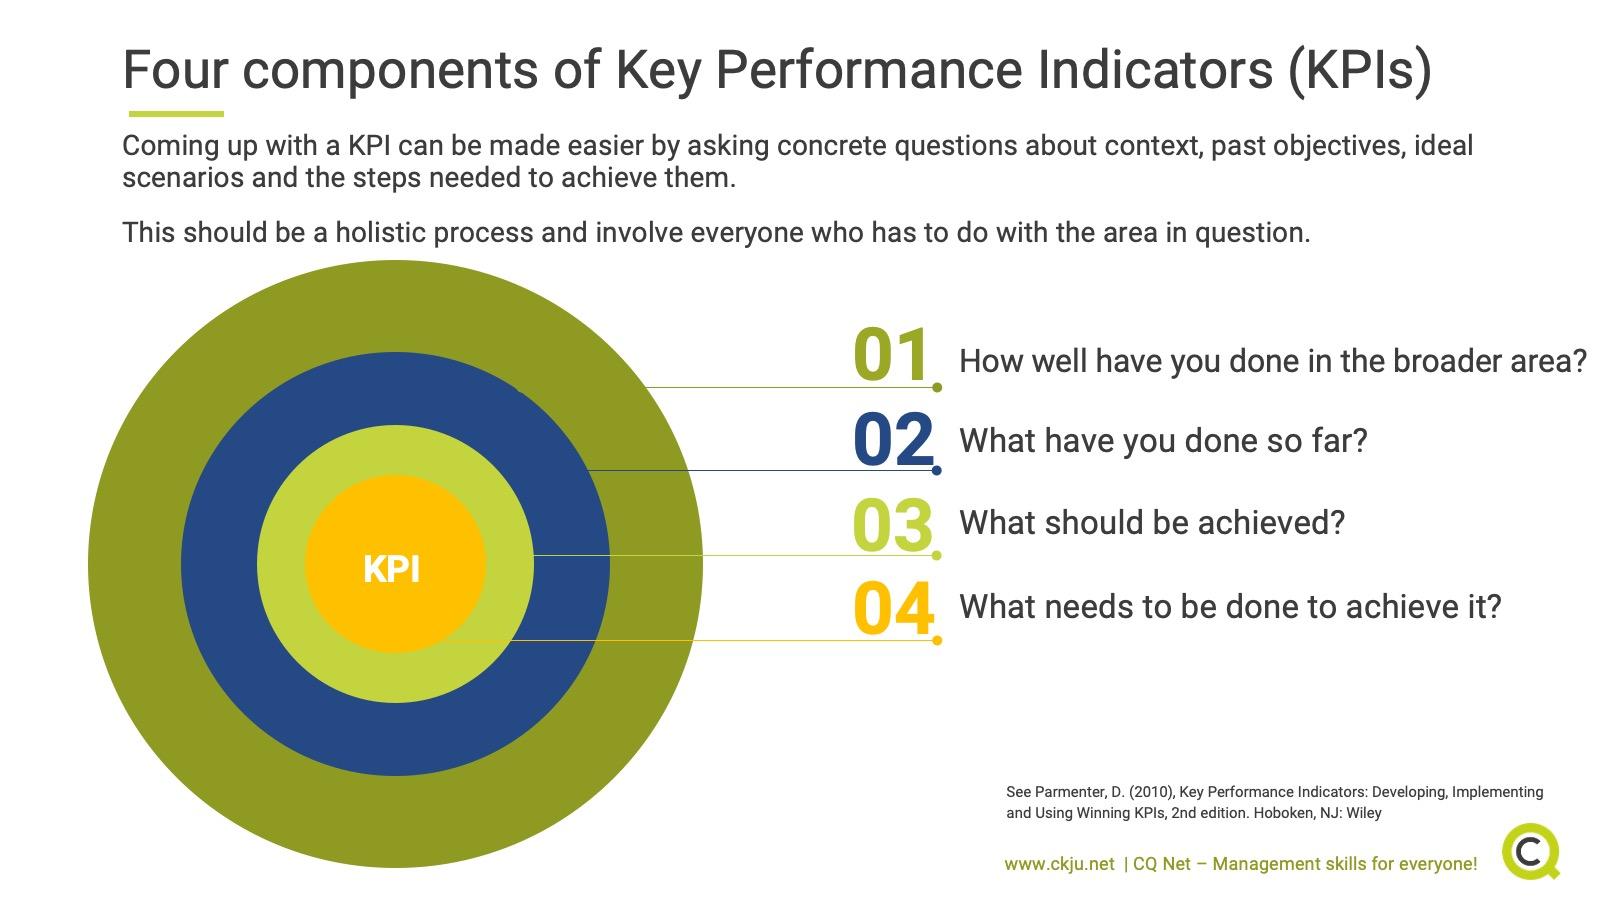 Four components of key performance indicators (KPI)